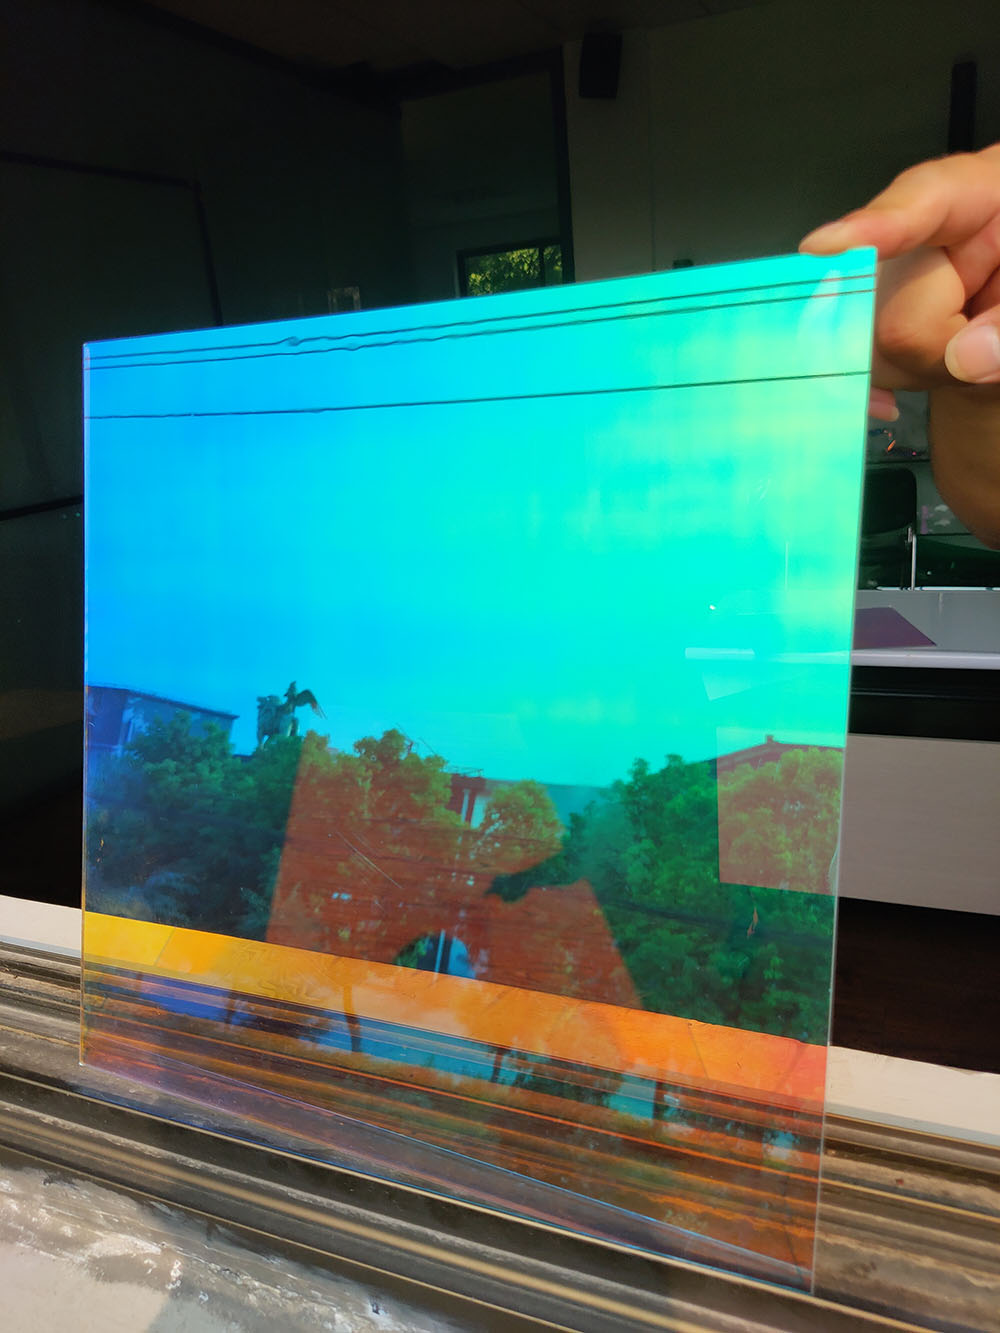 Sunice Dichroic Window Film Solar Tint DIY Decorative Window Glass Sticker Self Adhesive Rainbow Solar Tint Film 90x300cm